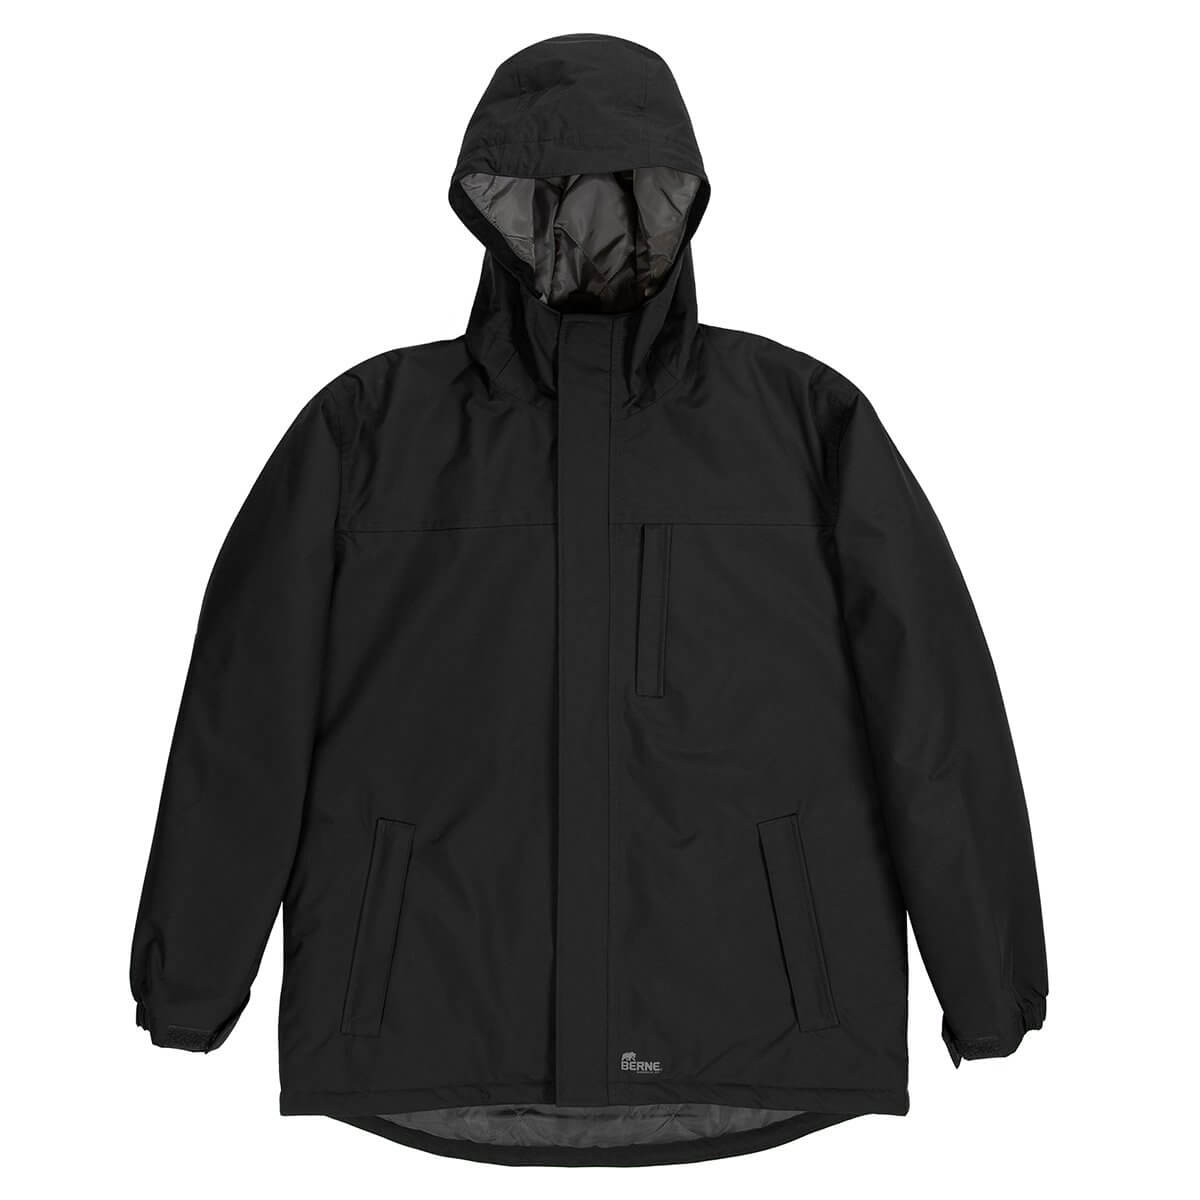 Men's Coastline Waterproof Storm Jacket - Black